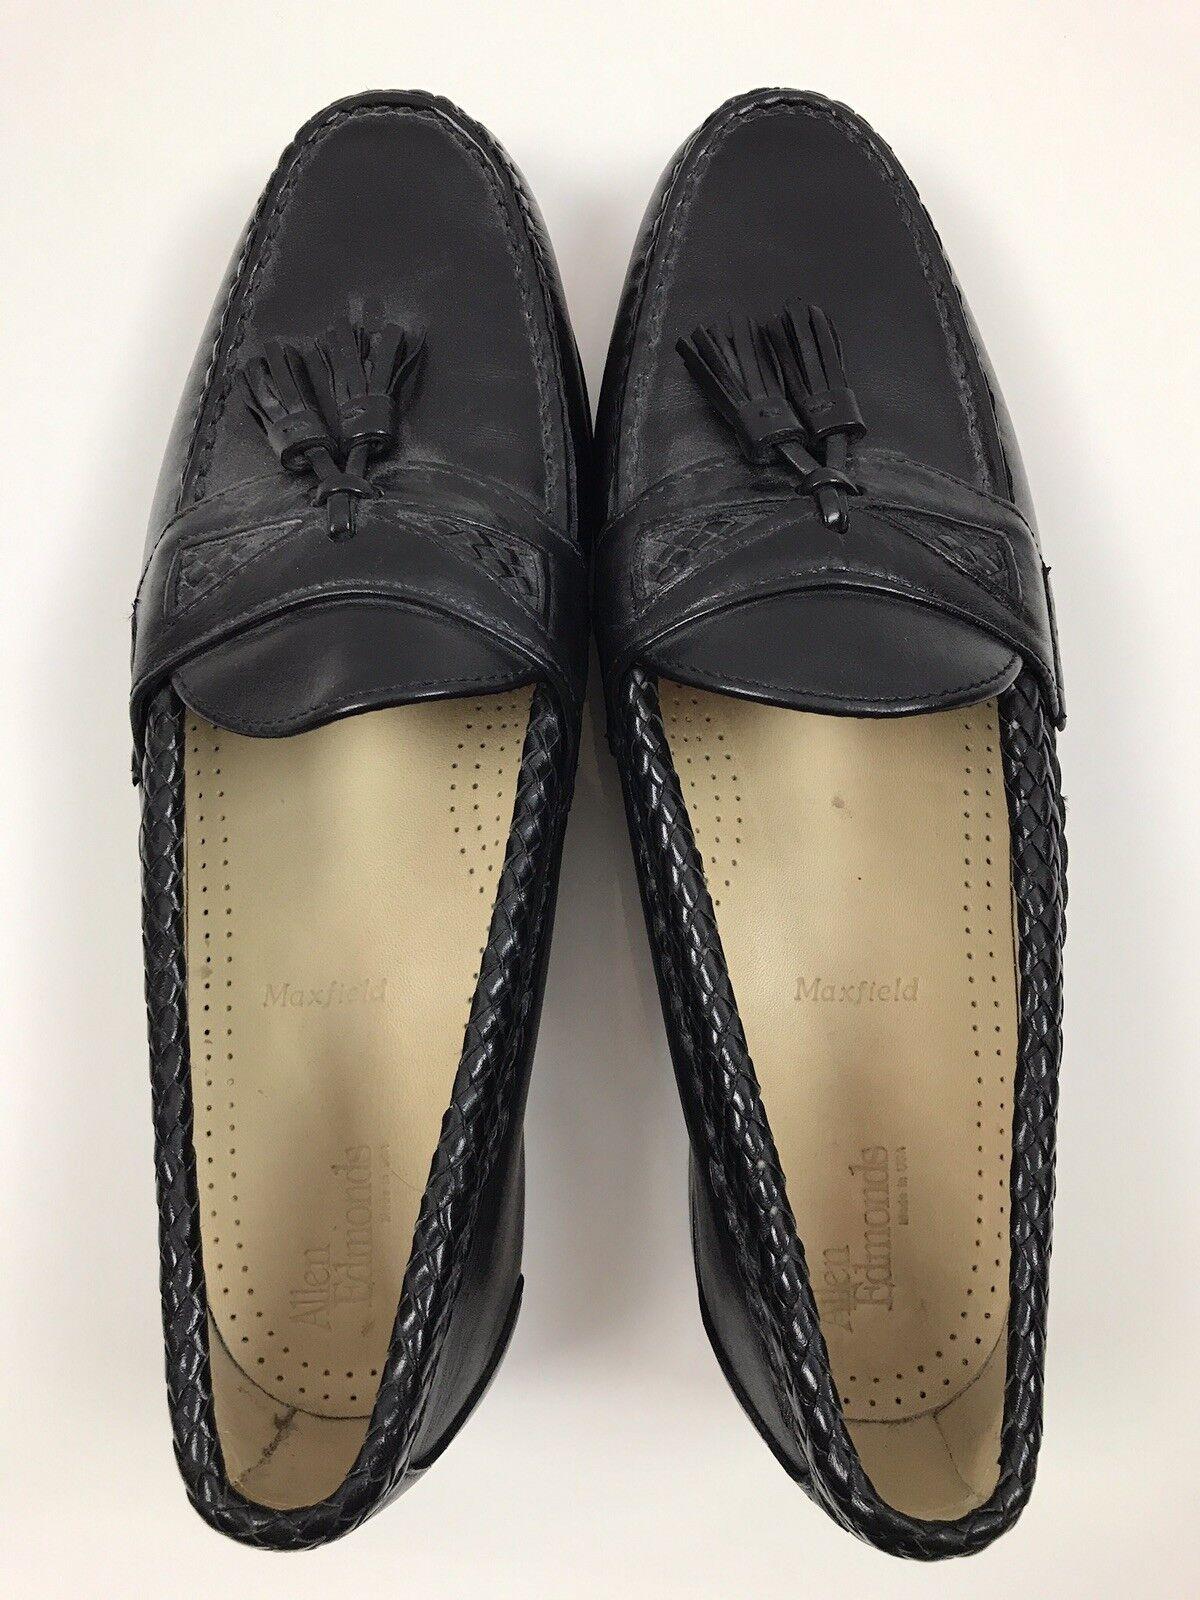 Allen Edmonds Black Maxfield Tassel Loafers Braided Mens 11 D shoes